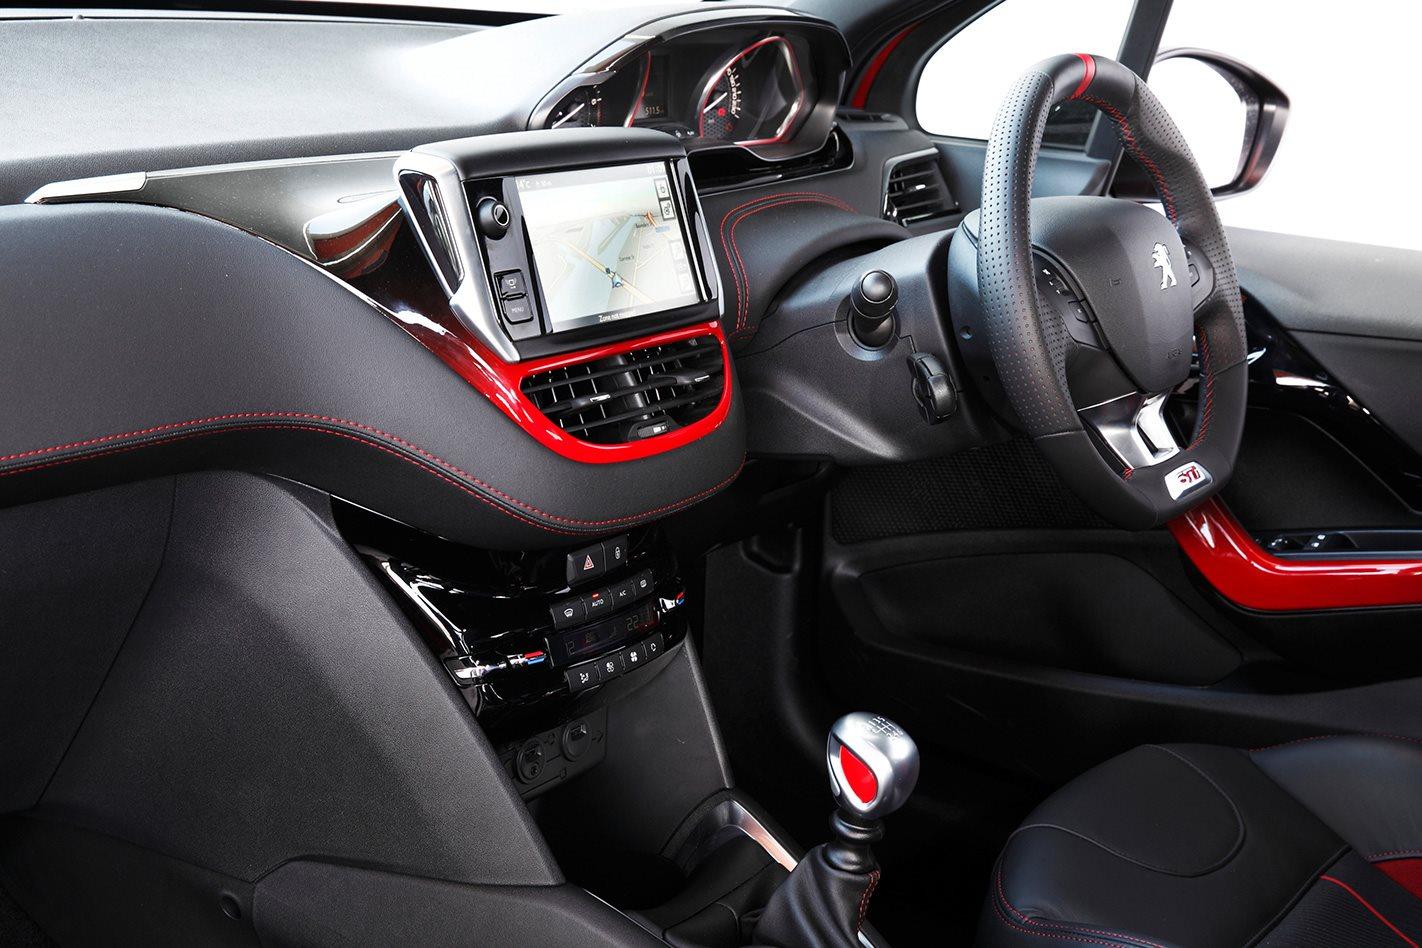 Ford fiesta st vs peugeot 208 gti classic motor motor for Peugeot 208 interior 2017